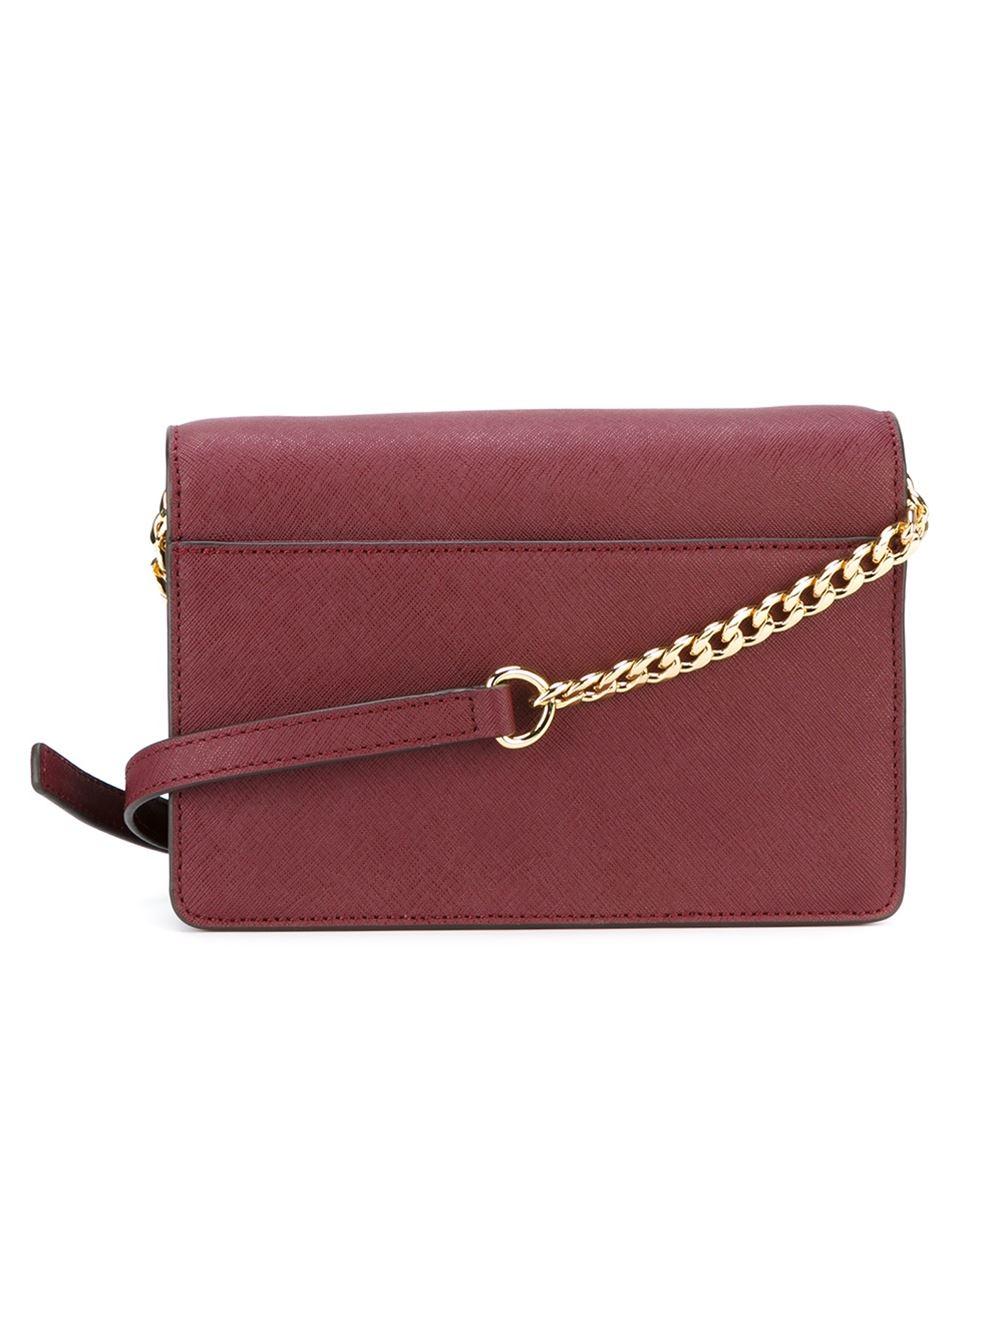 e8ce07d5c769 MICHAEL Michael Kors 'daniela' Crossbody Bag in Purple - Lyst